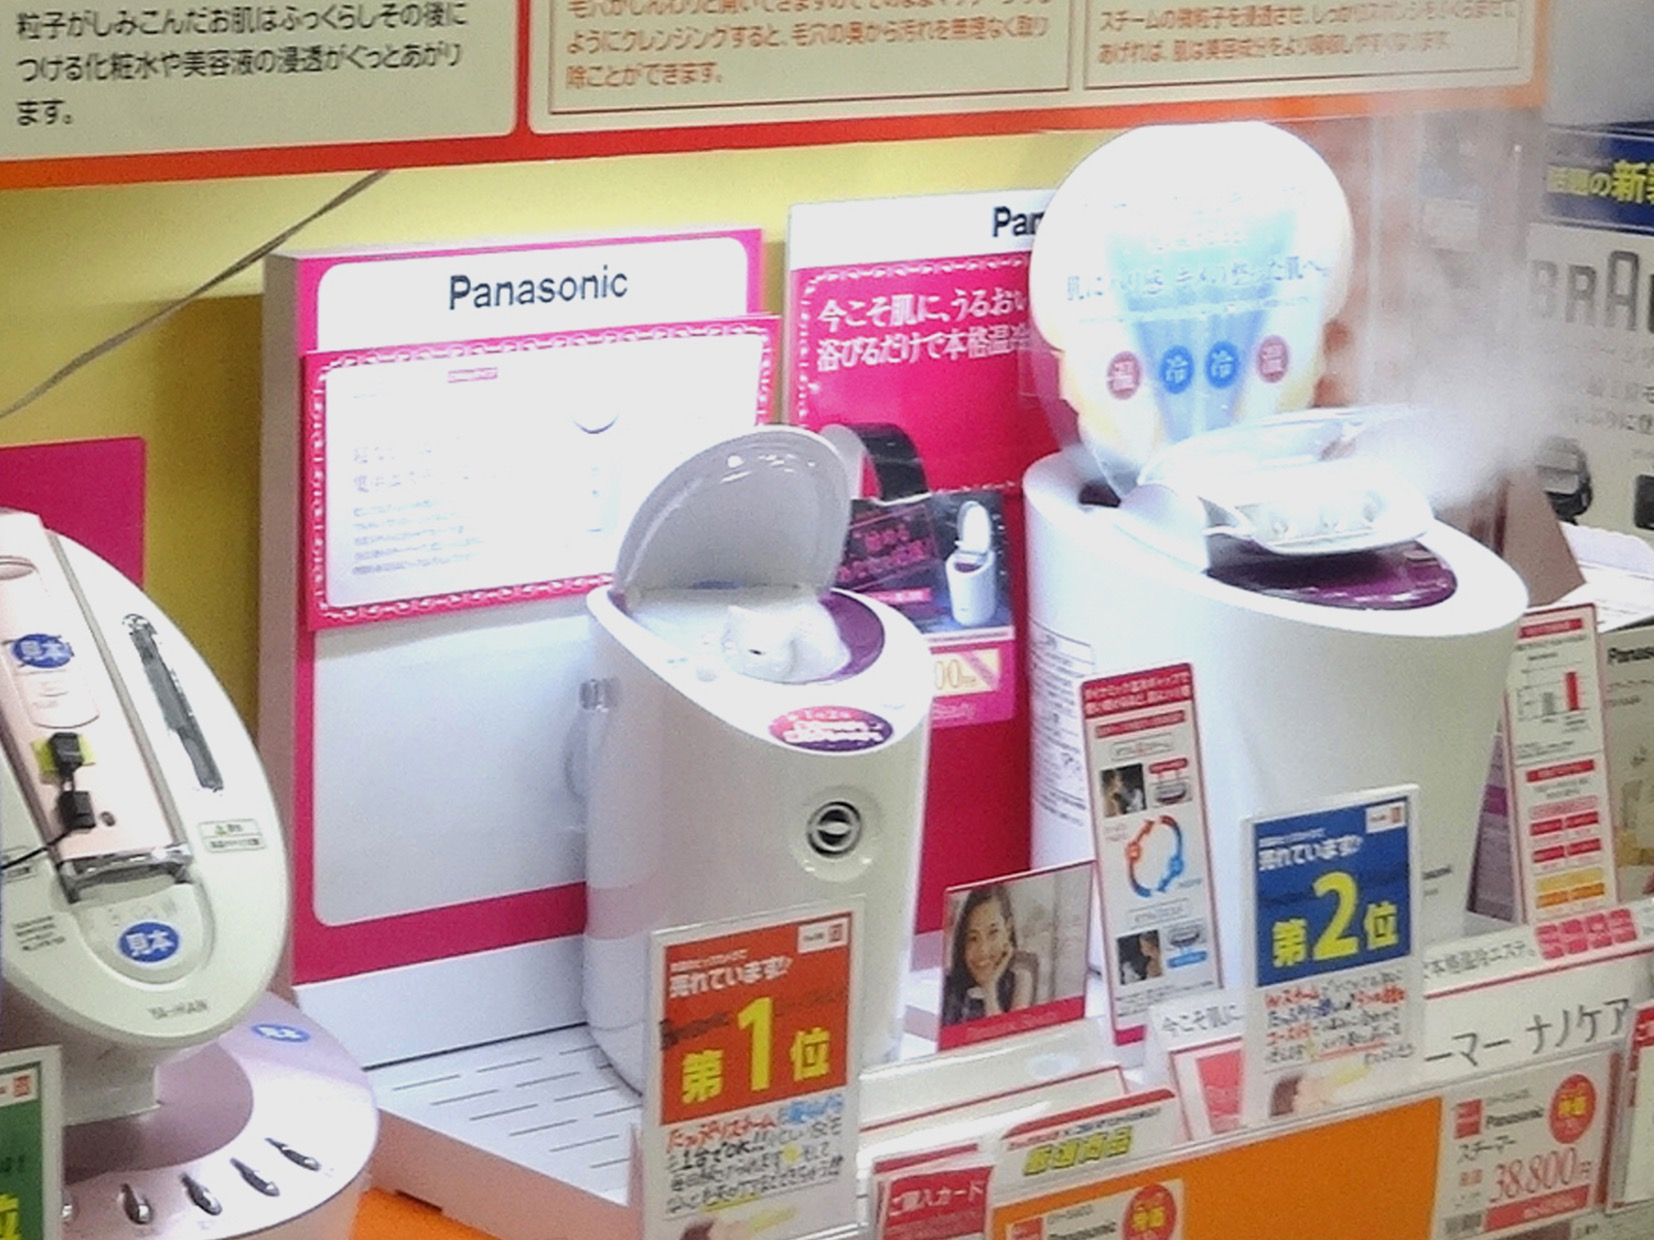 BICCAMERA广岛站店